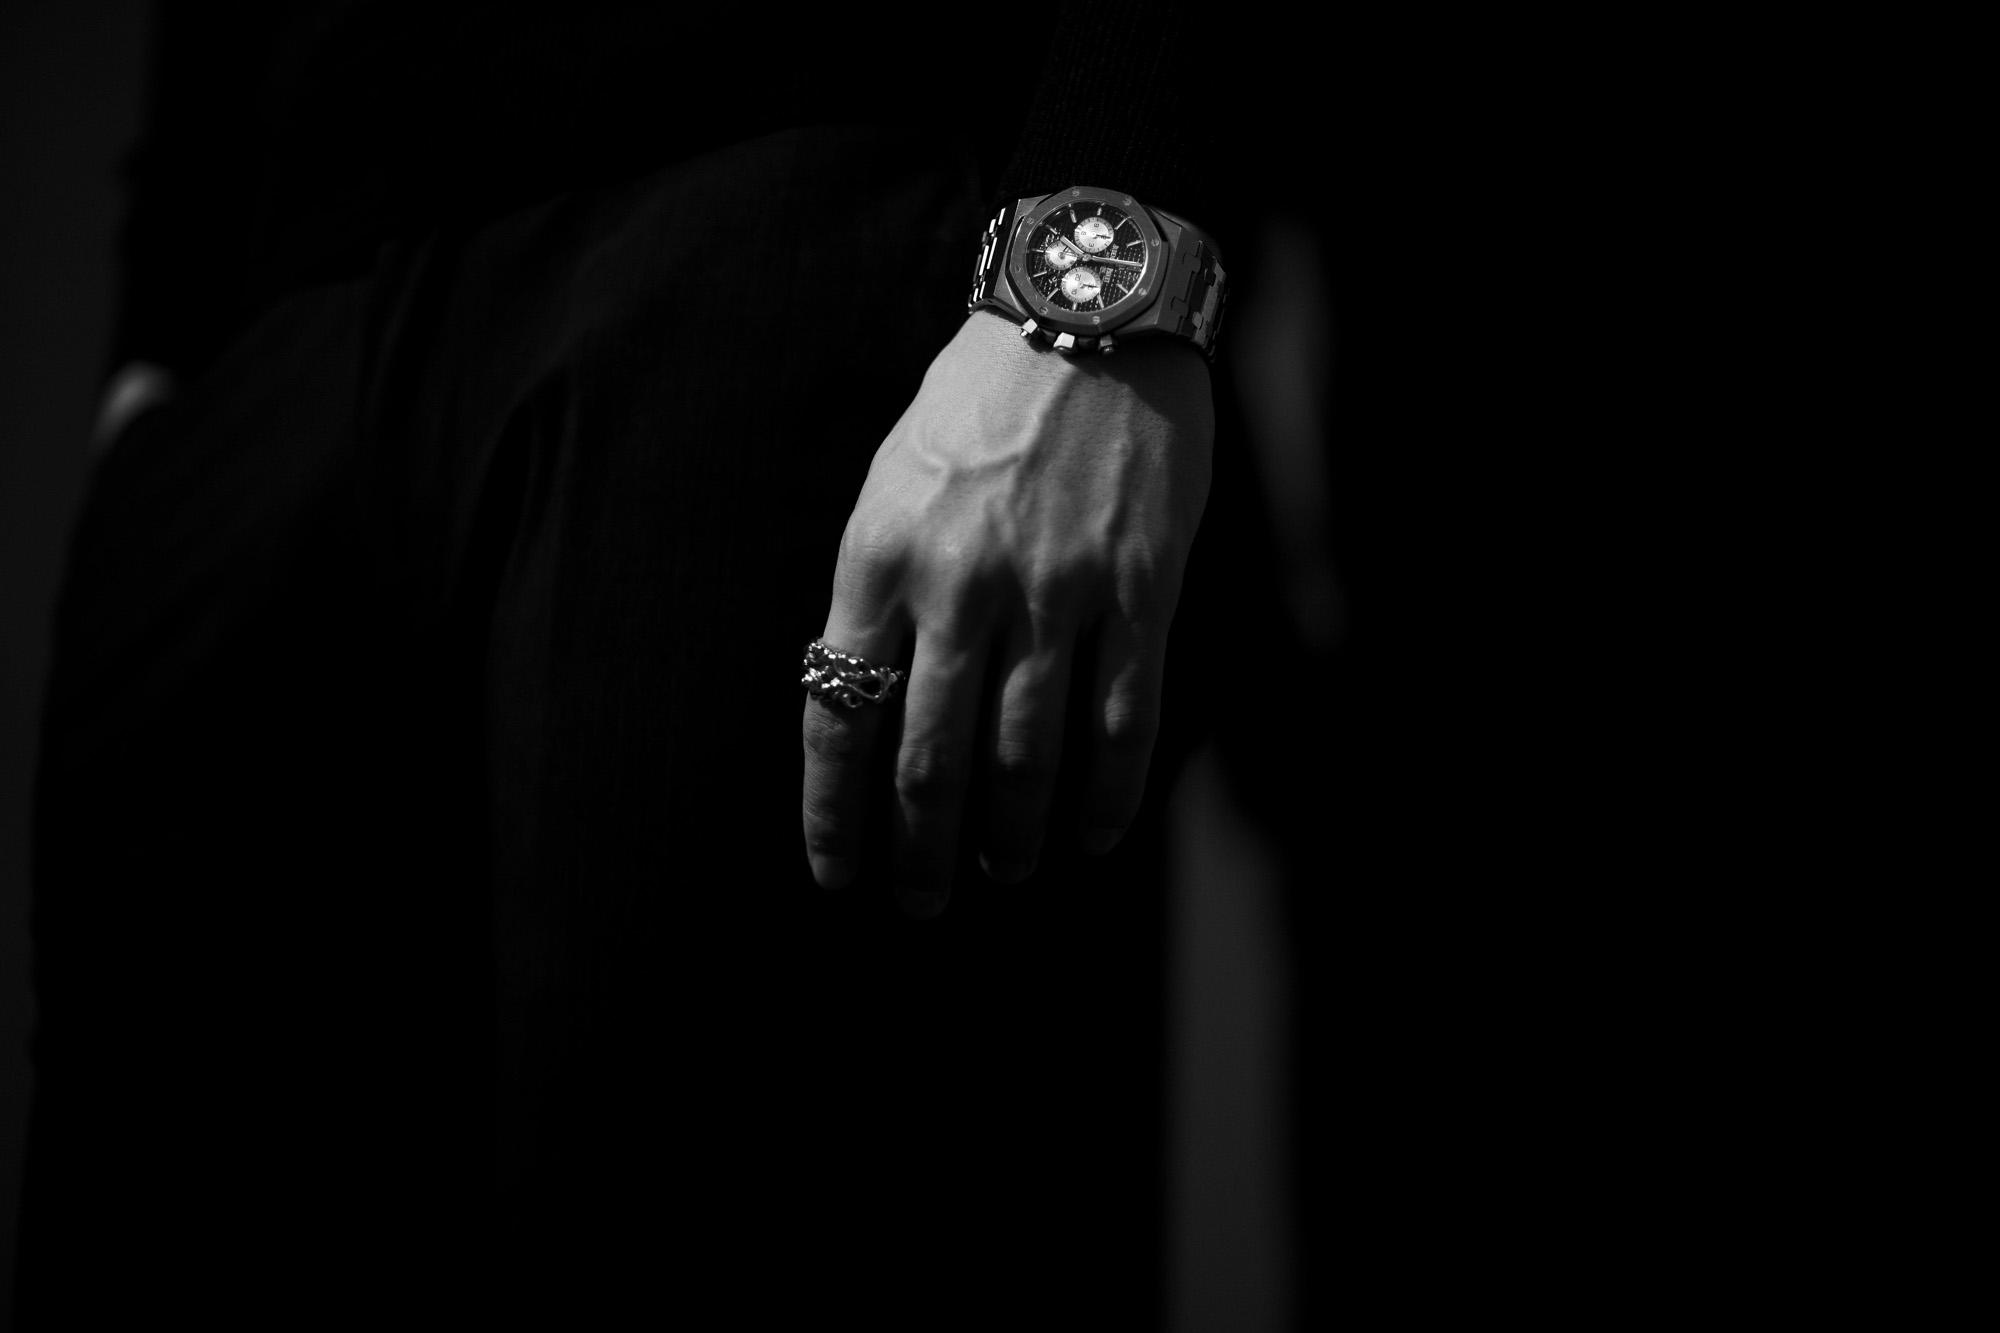 Balvenie Wilhelm VALIANT RING 22K GOLD 【Special Special Special Model】 バルヴェニー ヴィルヘルム 22Kゴールド ヴァリアント リング GOLD ゴールド 愛知 名古屋 Alto e Diritto altoediritto アルトエデリット スペシャルリング ゴールドリング